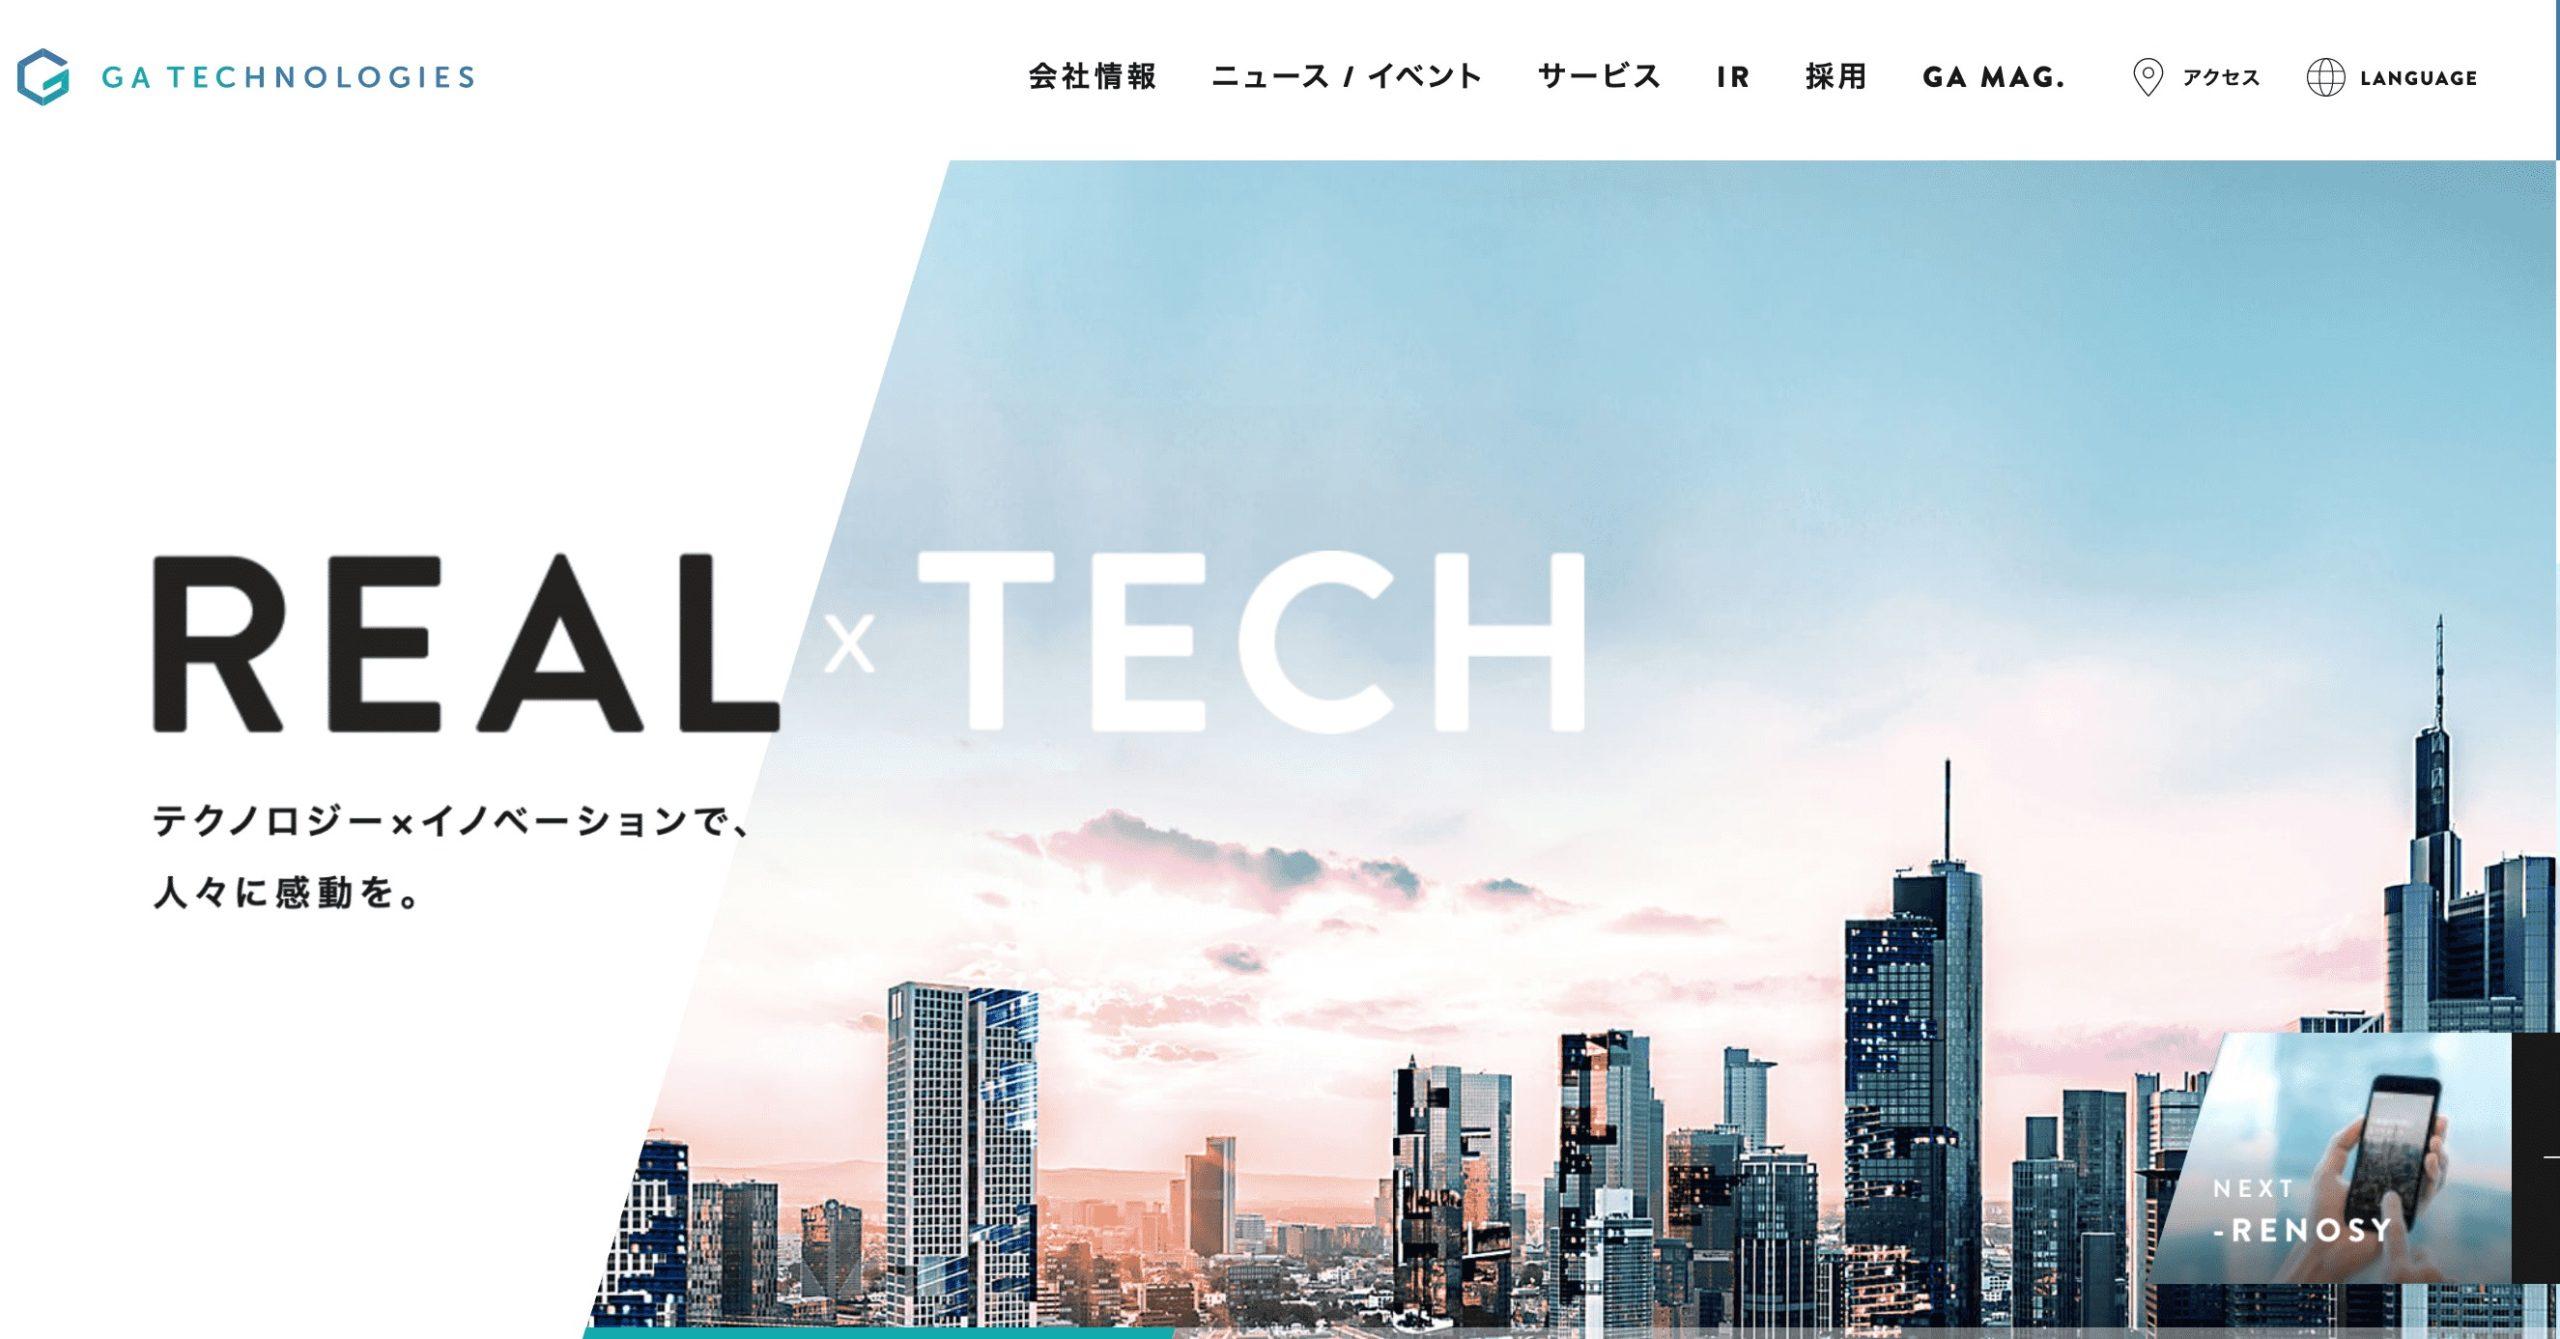 2-1.①Gatechnologies(GAテクノロジーズ)